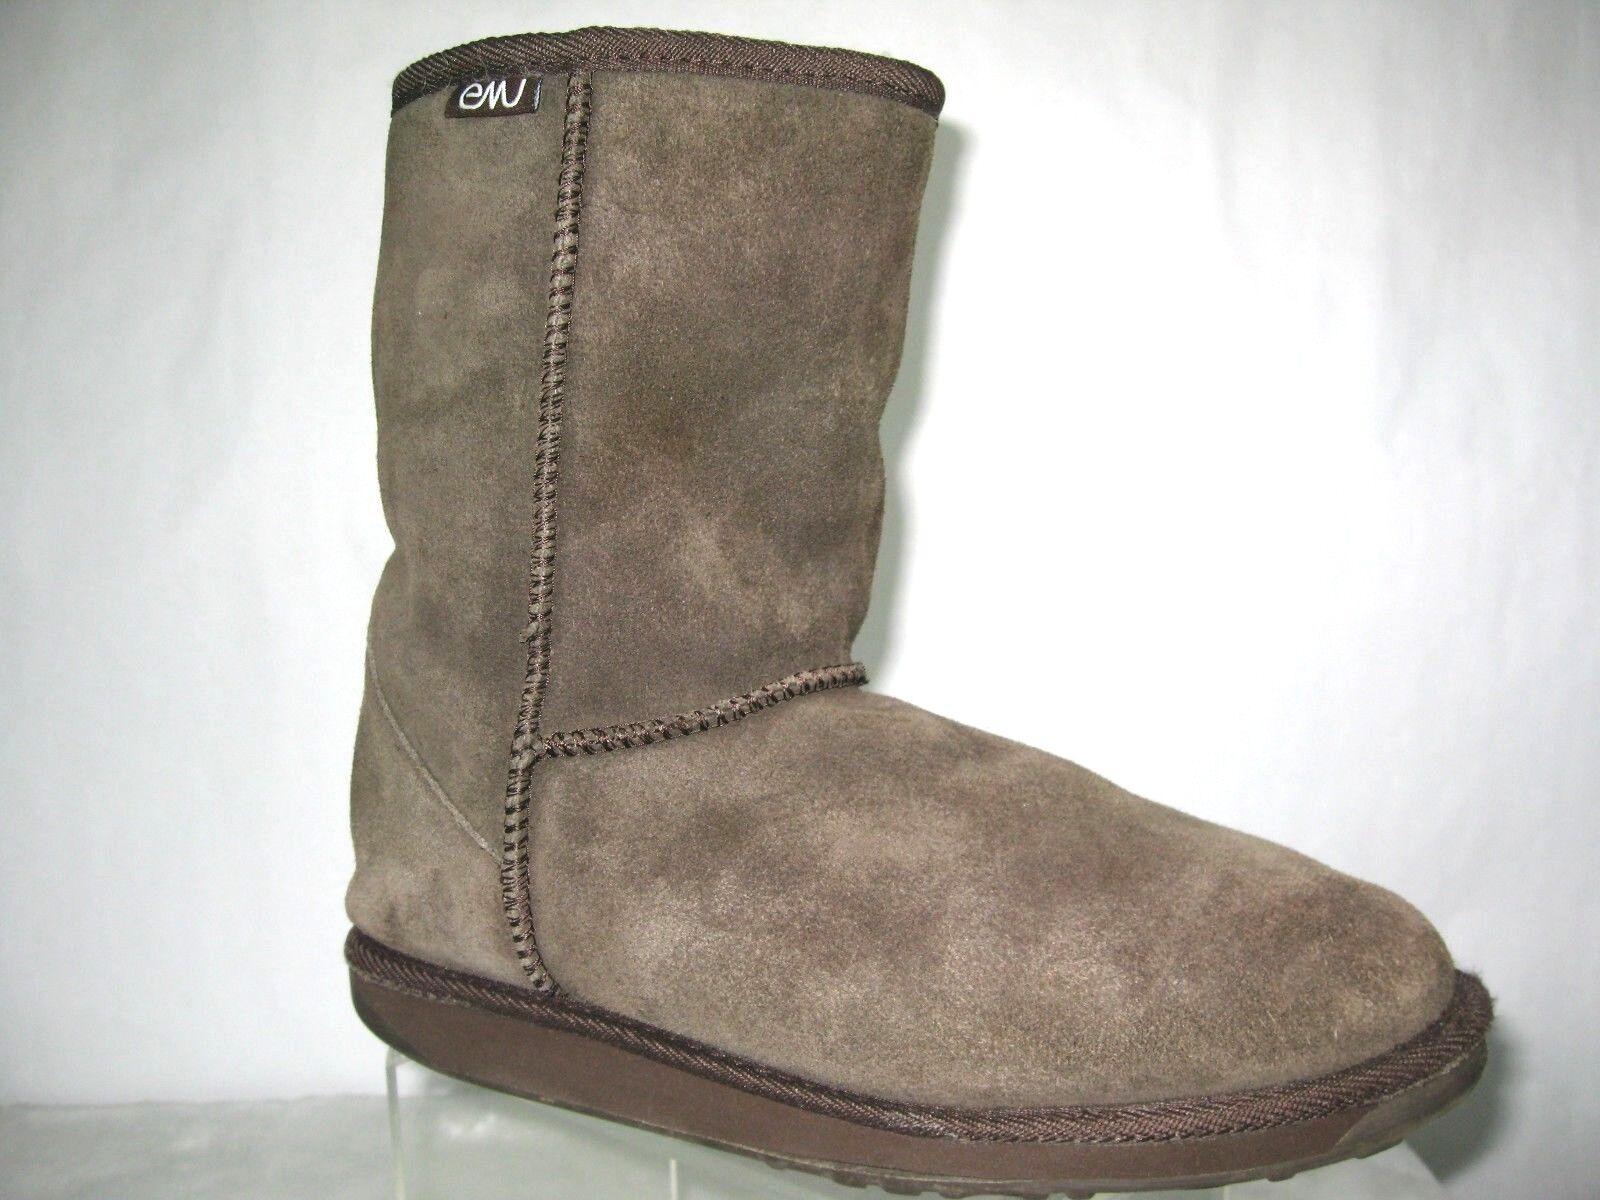 Emu Womens Boots Gray US Women Sz 8/Men Sz 7 100% Merino Wool  Bronte Lo